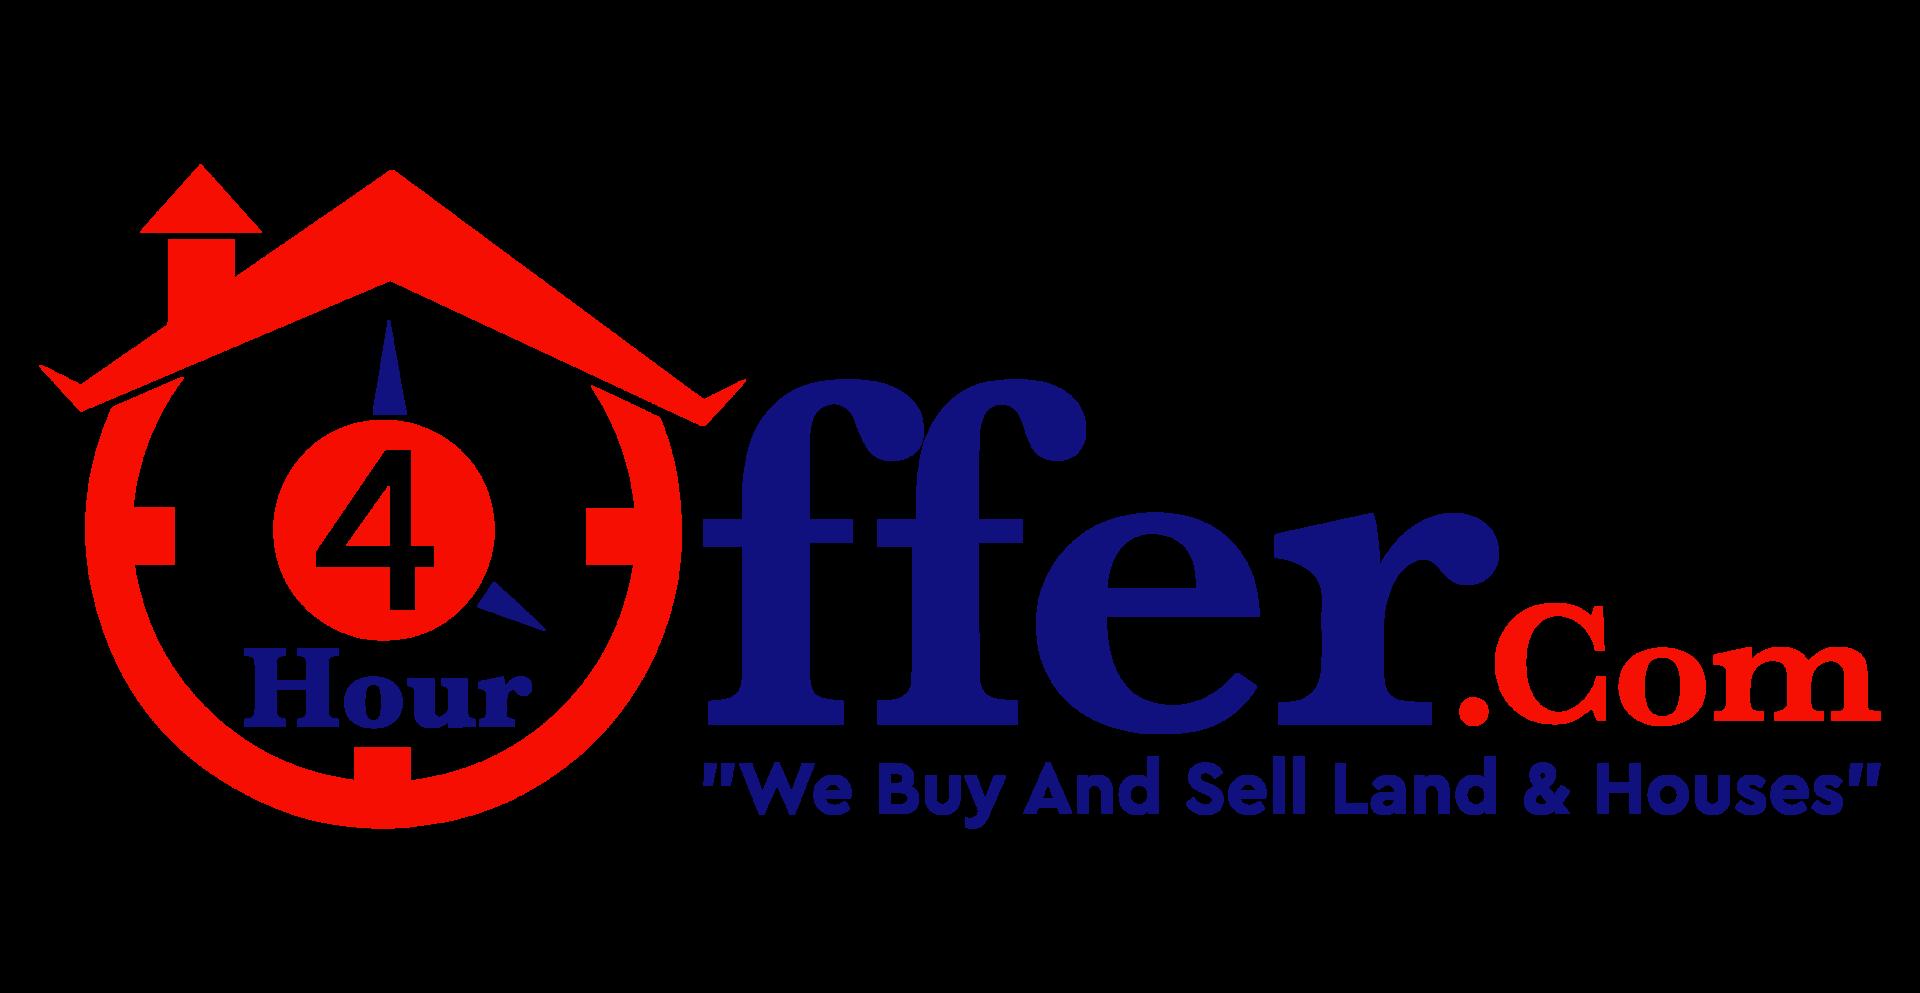 4 Hour Offer logo